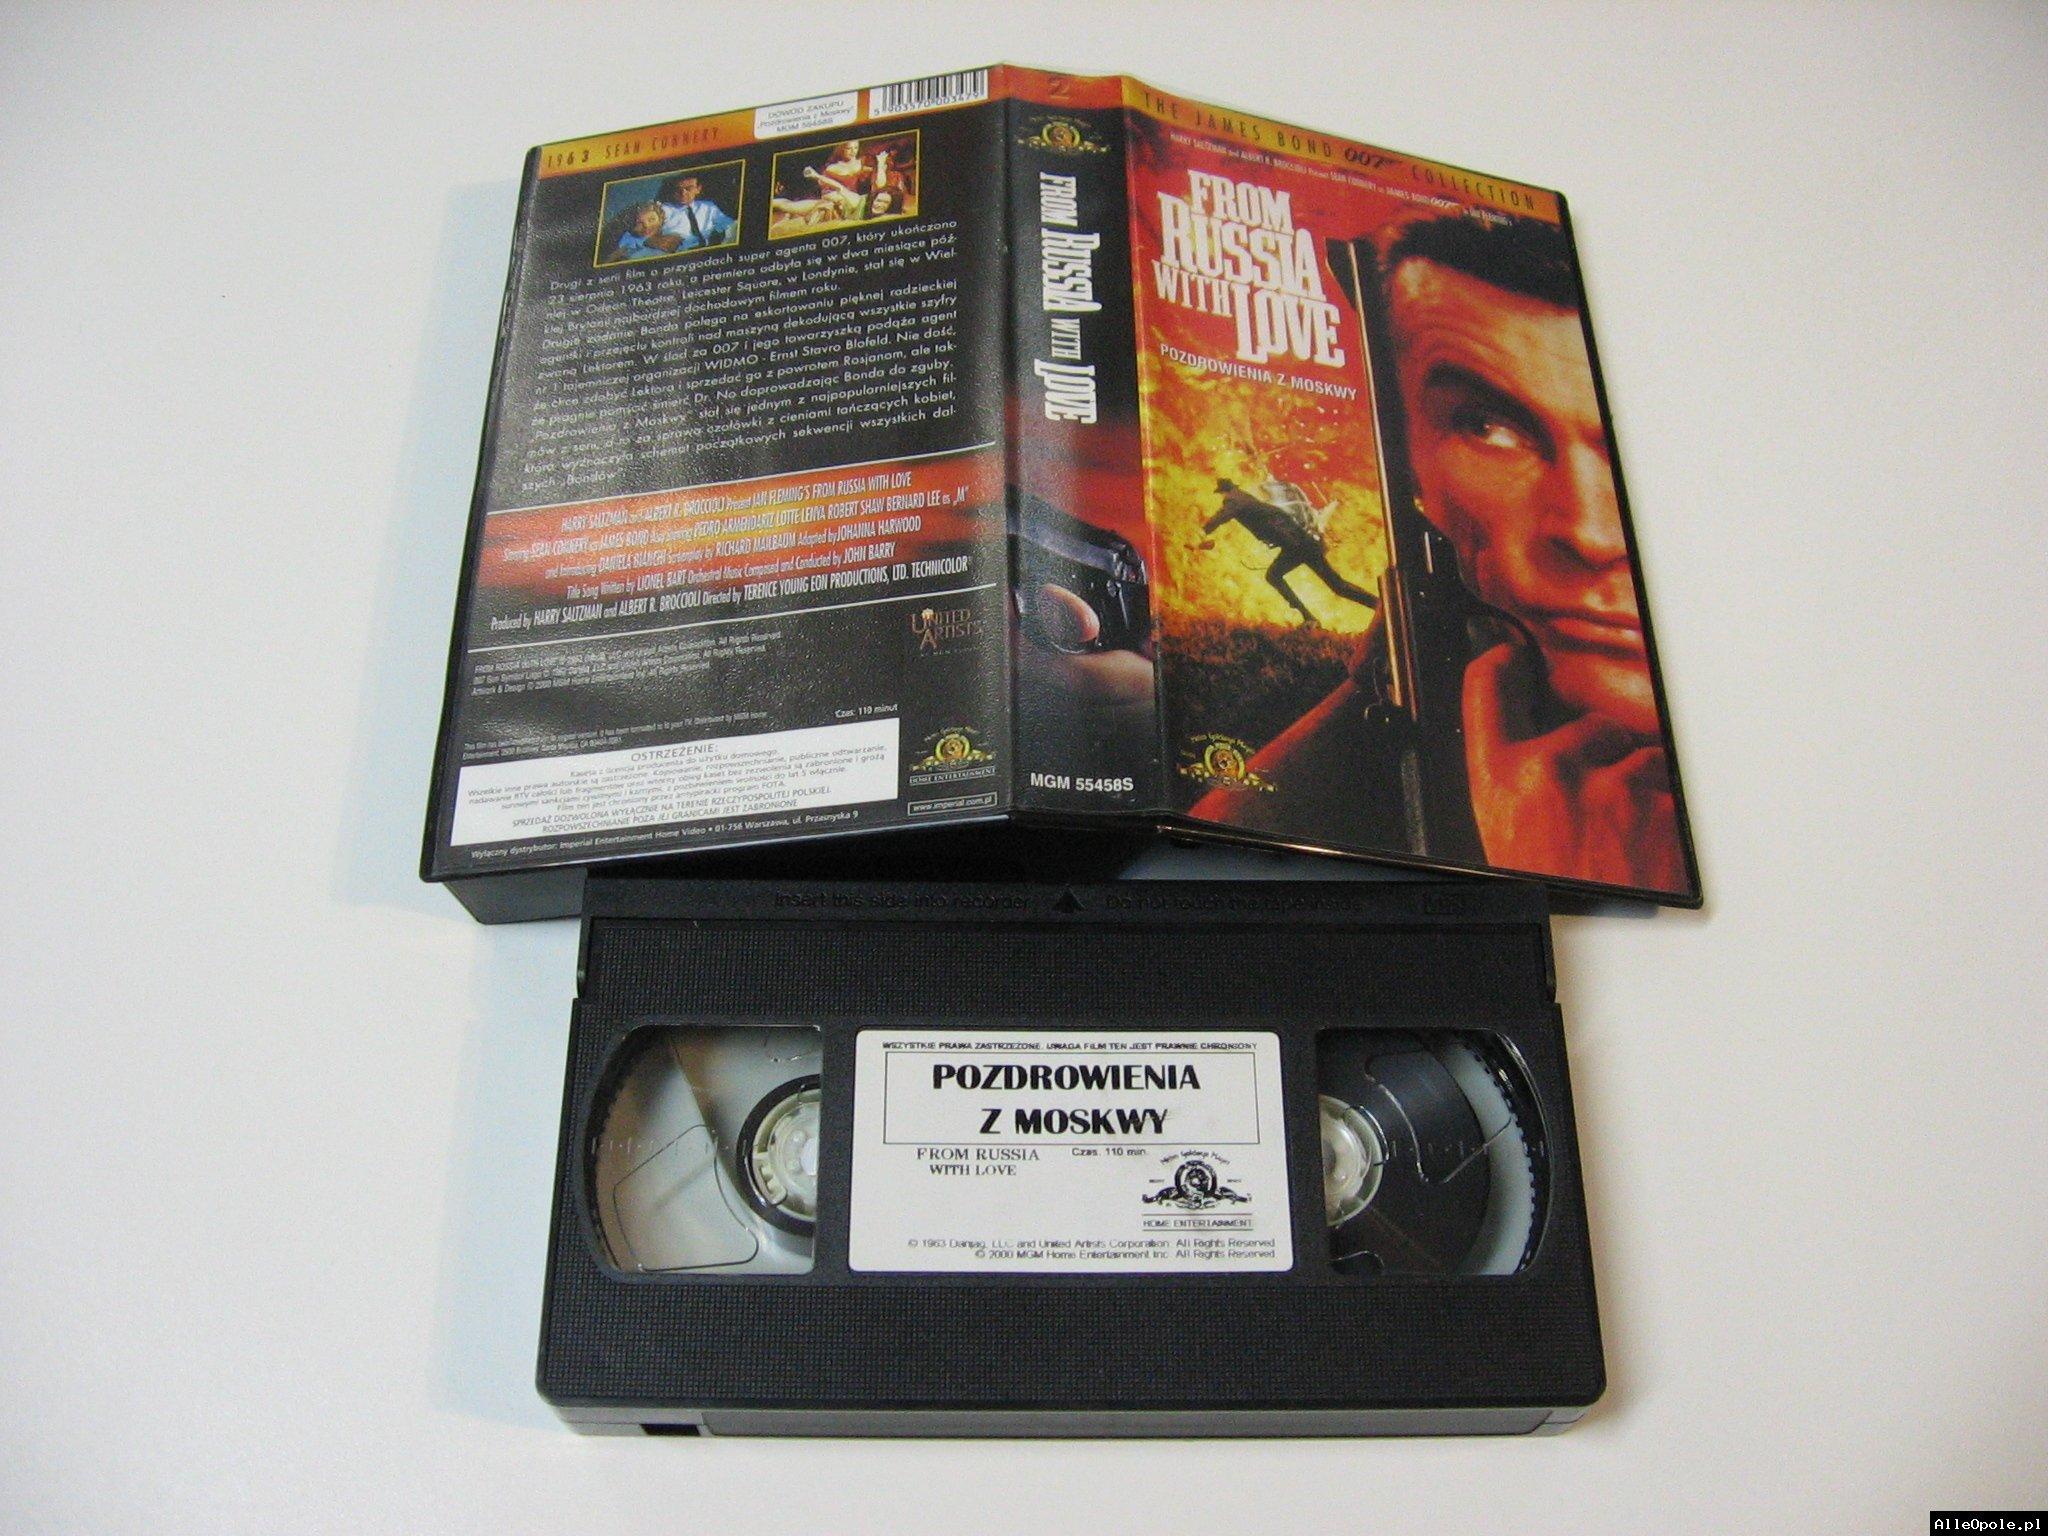 007 POZDROWIENIA Z MOSKWY - VHS Kaseta Video - Opole 1735